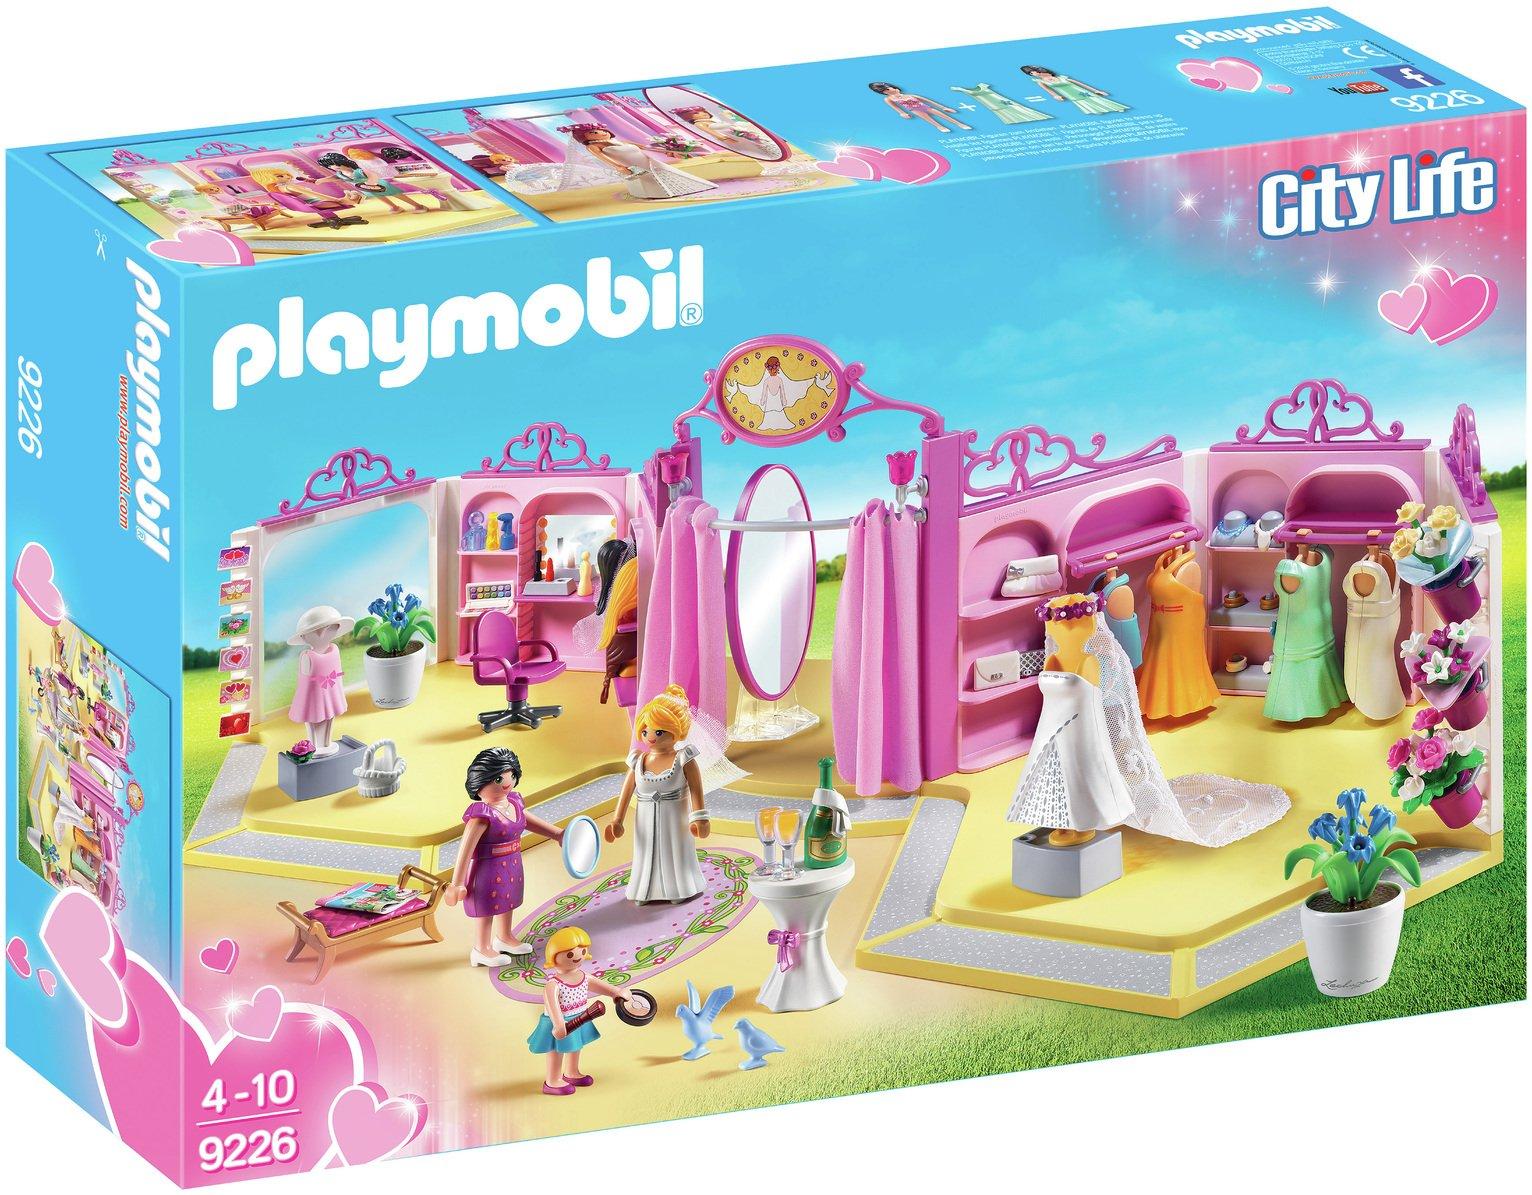 Playmobil 9226 City Life Bridal Shop